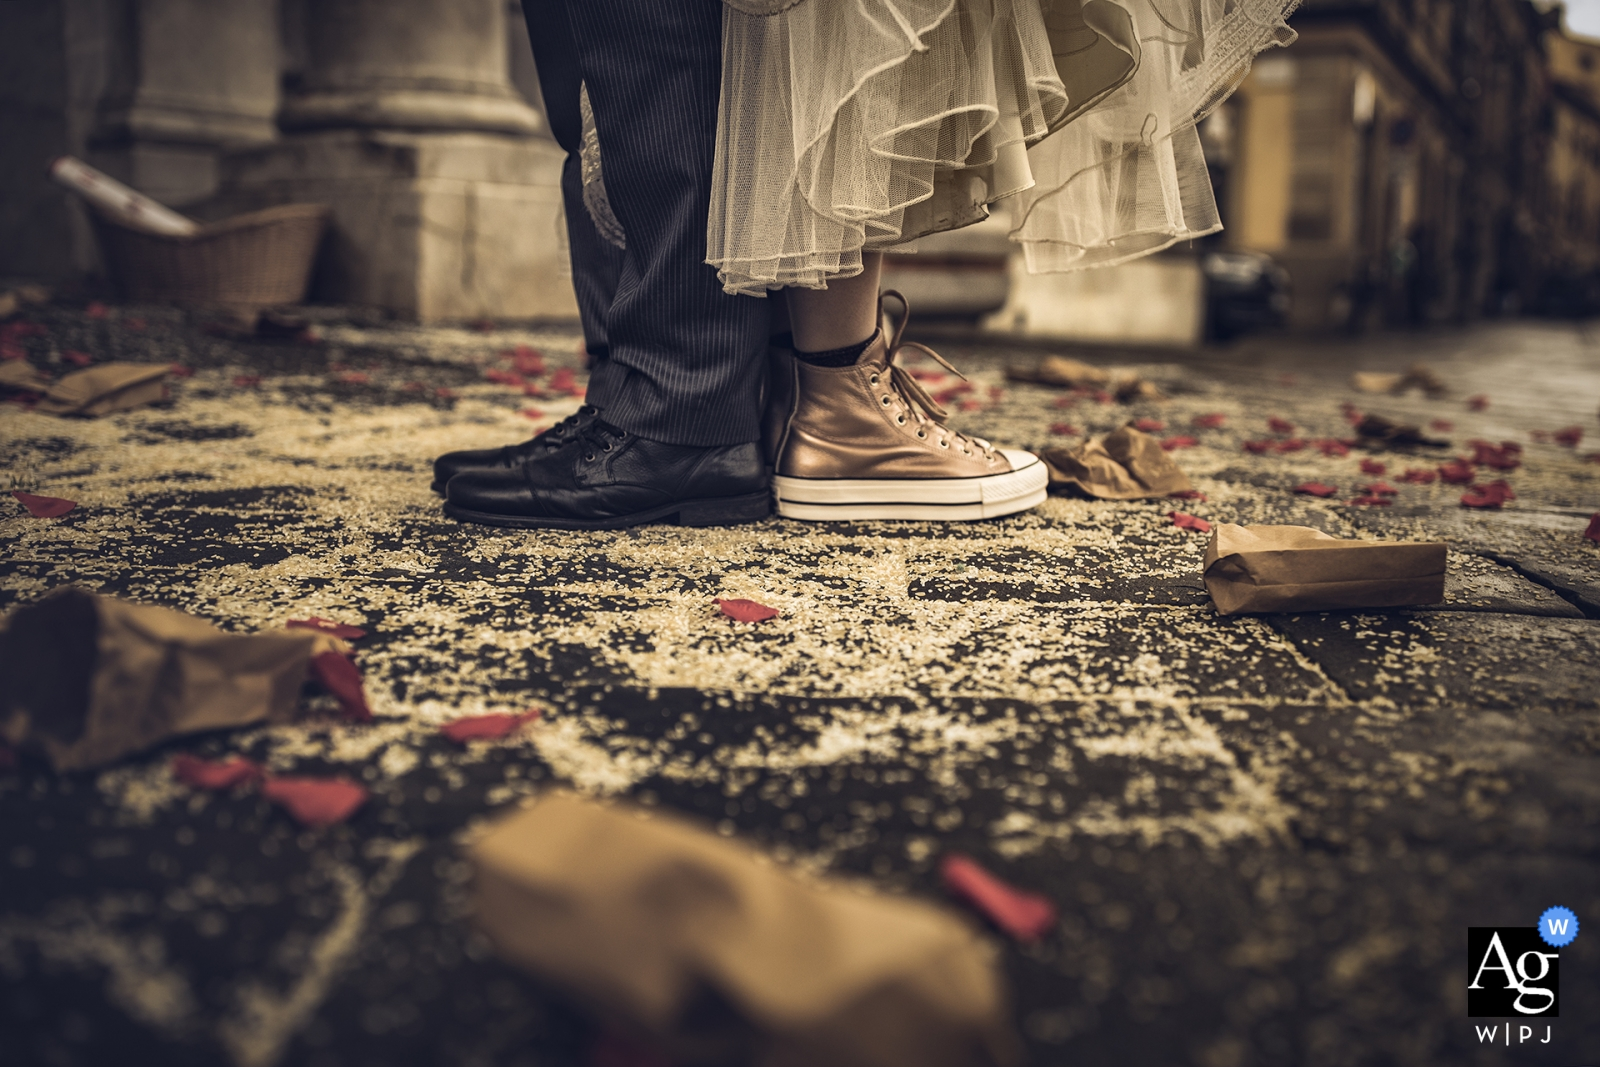 La Spezia wedding day photography   Converse bride shoes details at the wedding